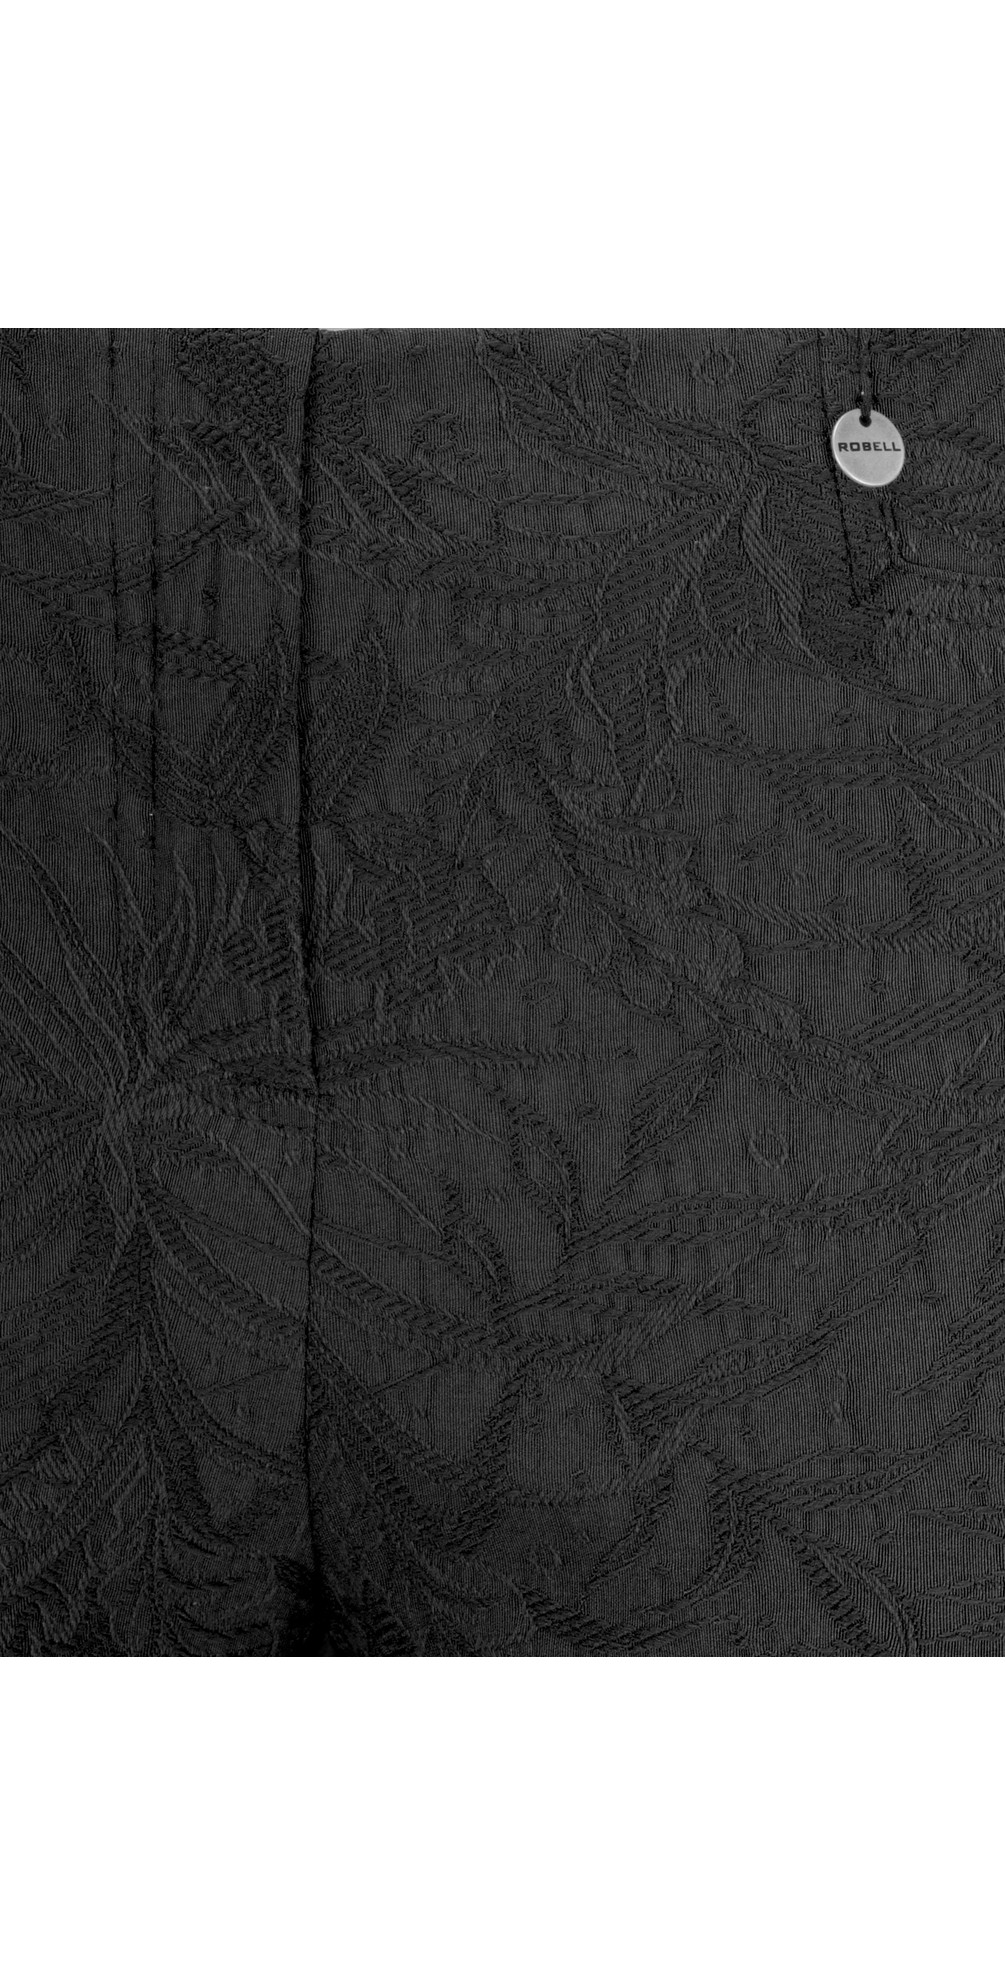 Rose 09 Black Ankle Length Jacquard Slimfit Trouser main image